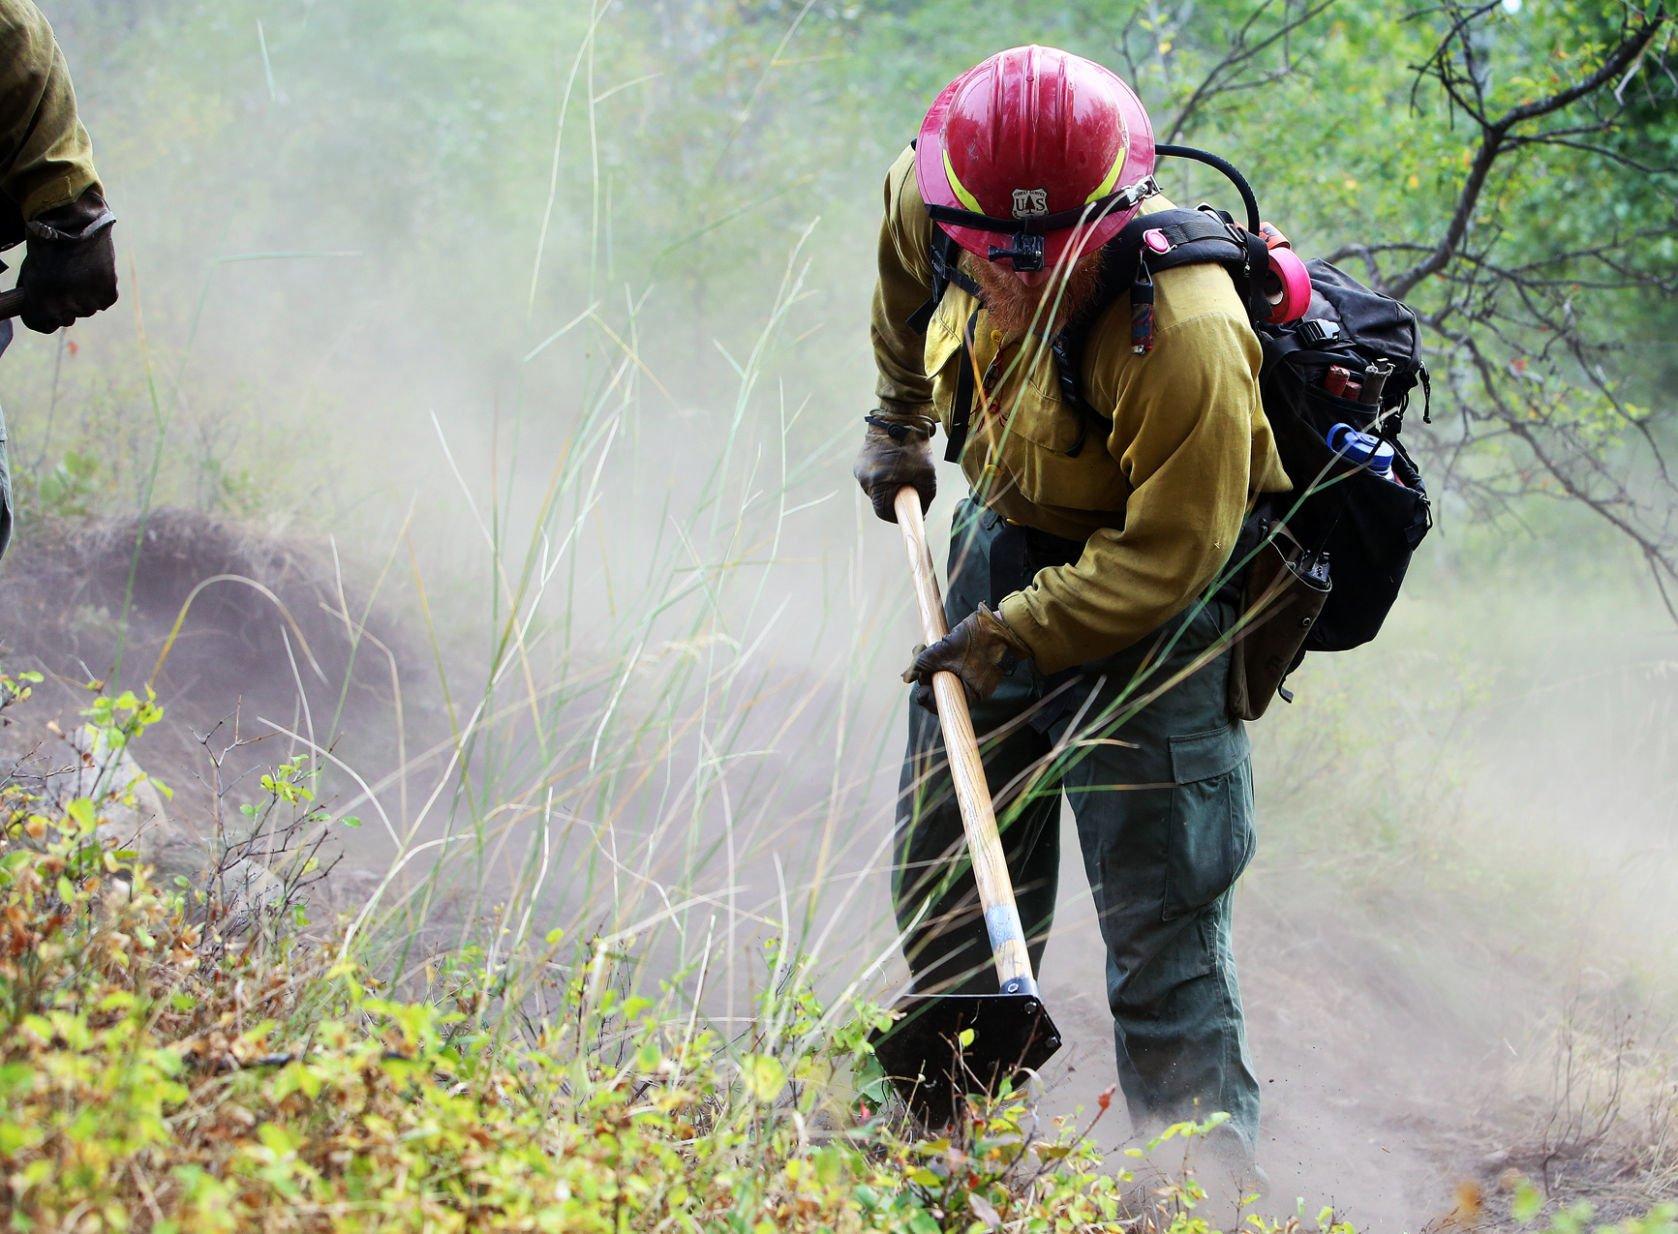 Wildland firefighter, 19, killed by falling tree near Seeley Lake